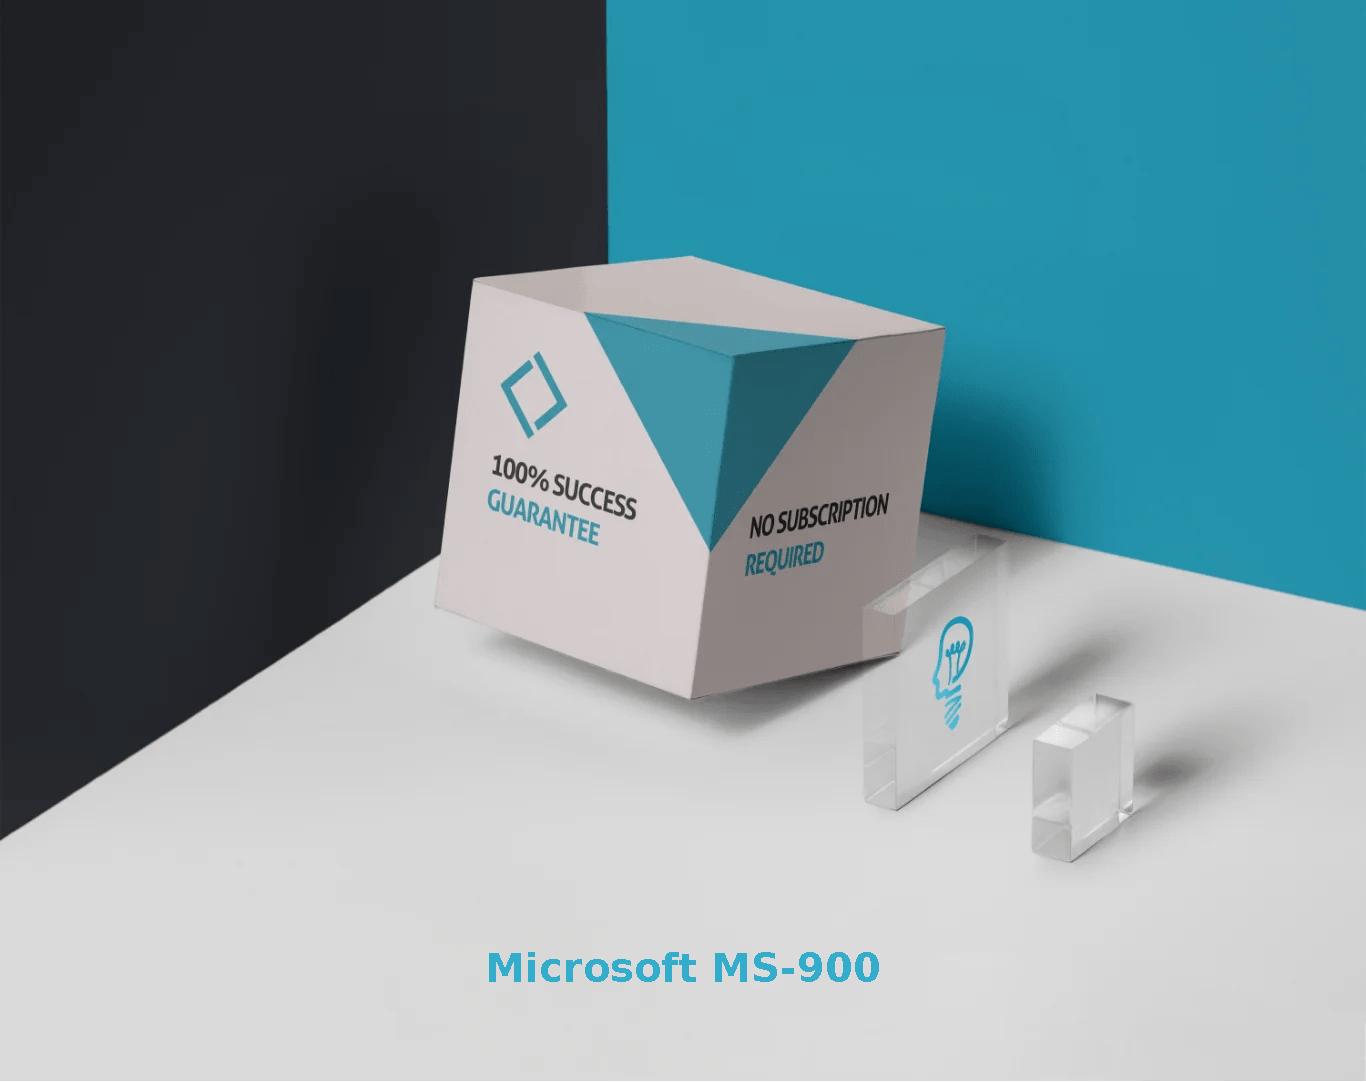 Microsoft MS-900 Exams